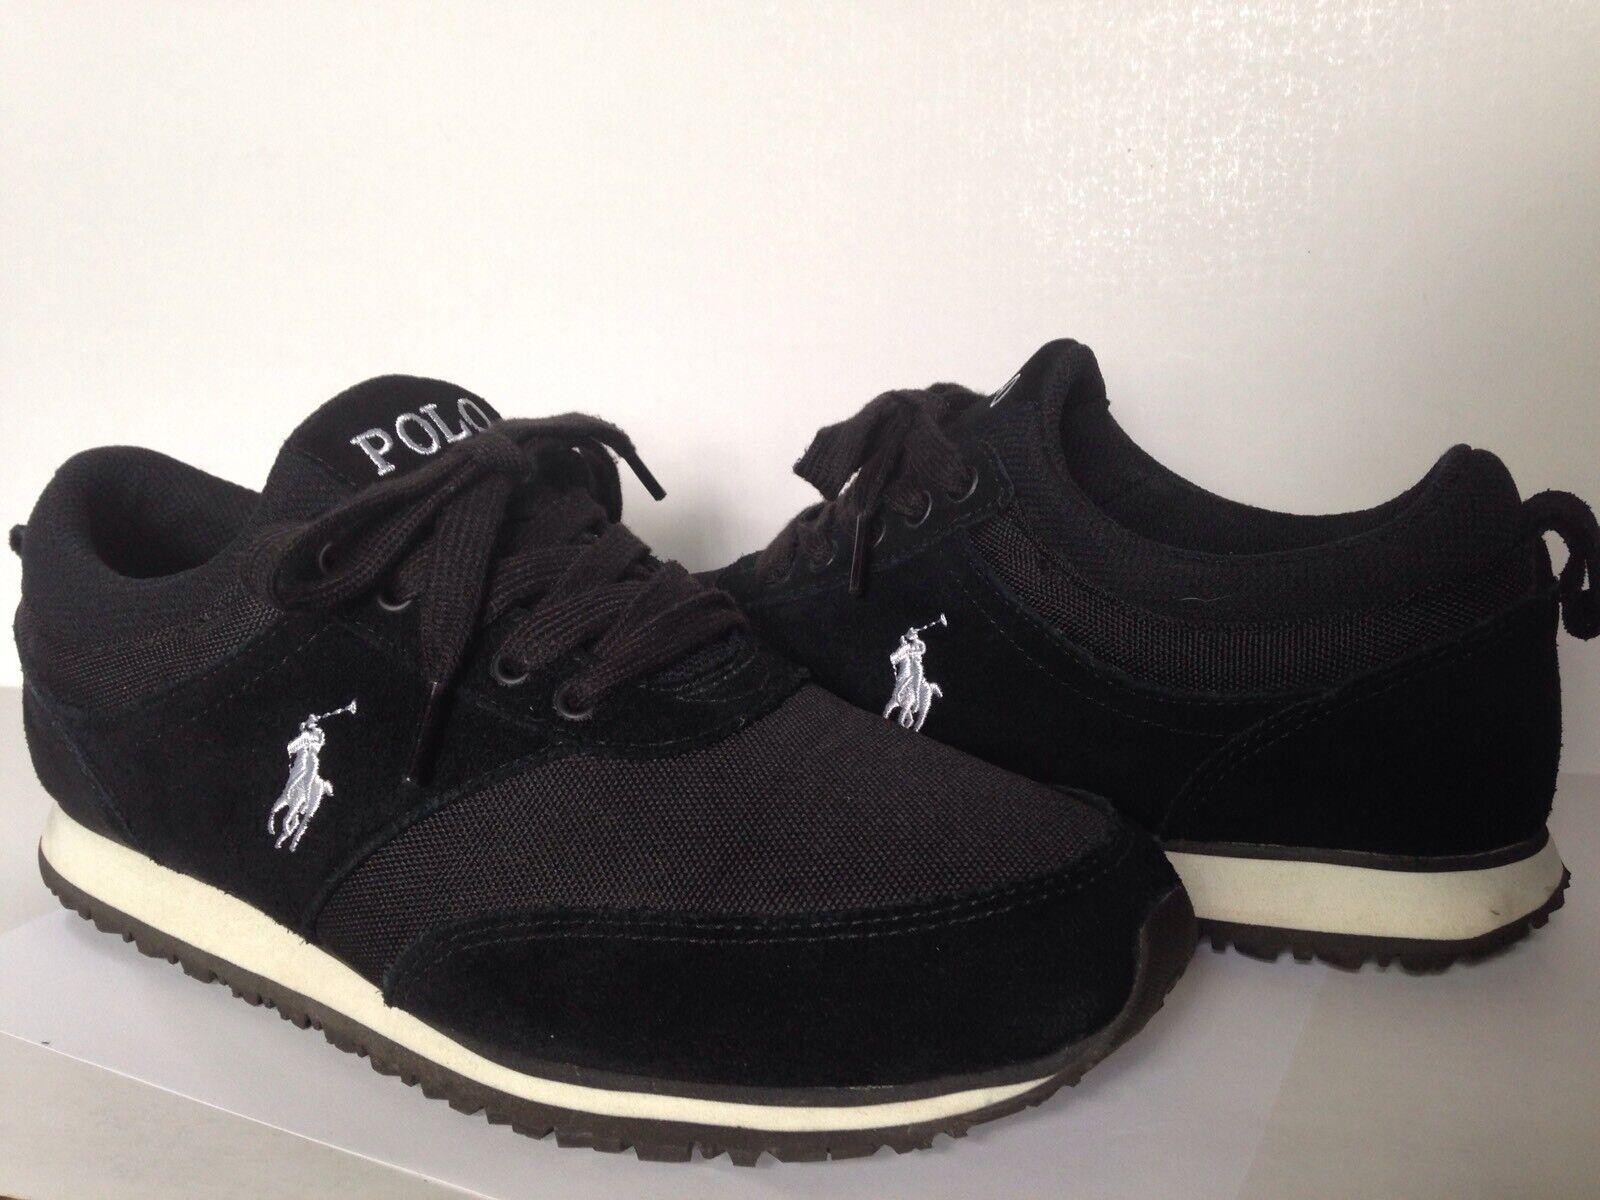 Polo Ralph Lauren Zapatos Arboledas Negro Zapatillas zapatillas Reino Unido 9D, US 10